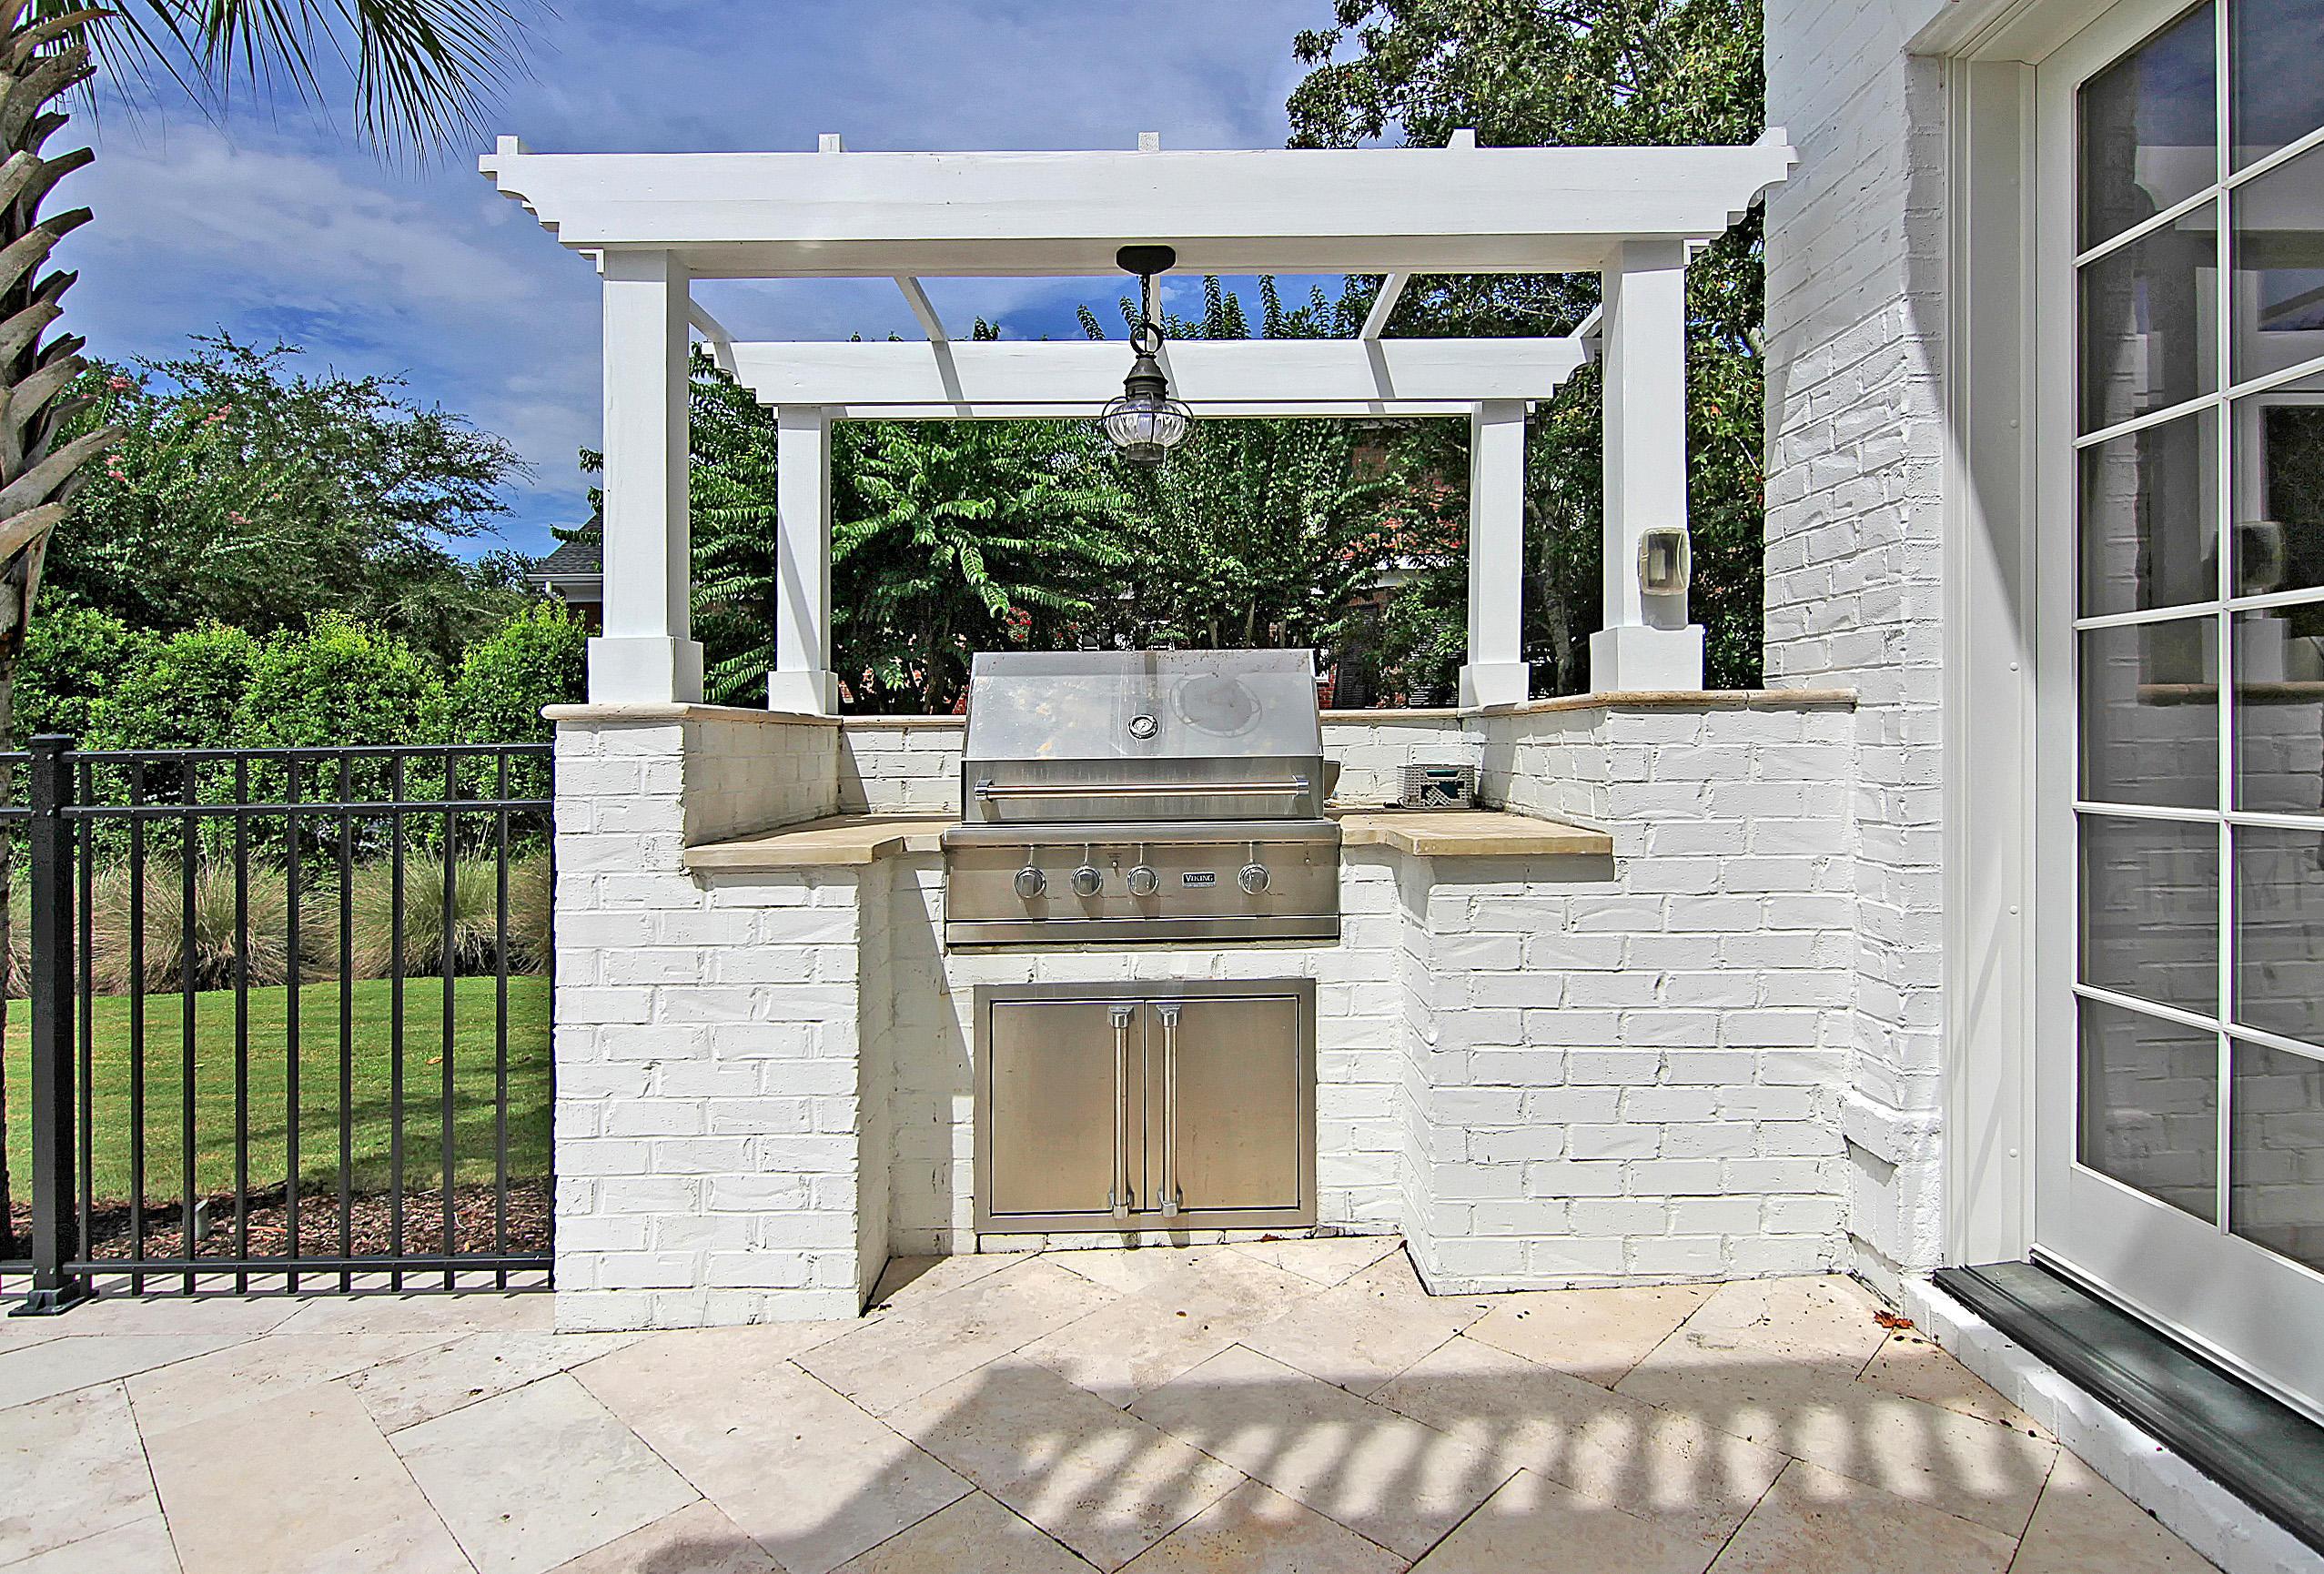 Daniel Island Homes For Sale - 79 Dalton, Charleston, SC - 75